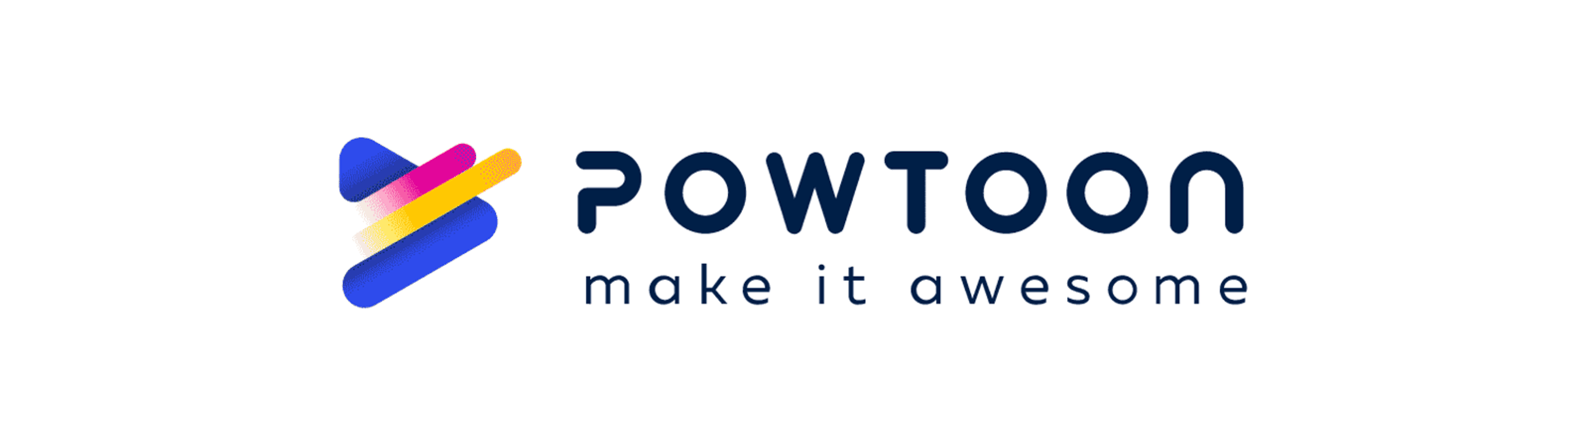 Logo for Powtoon